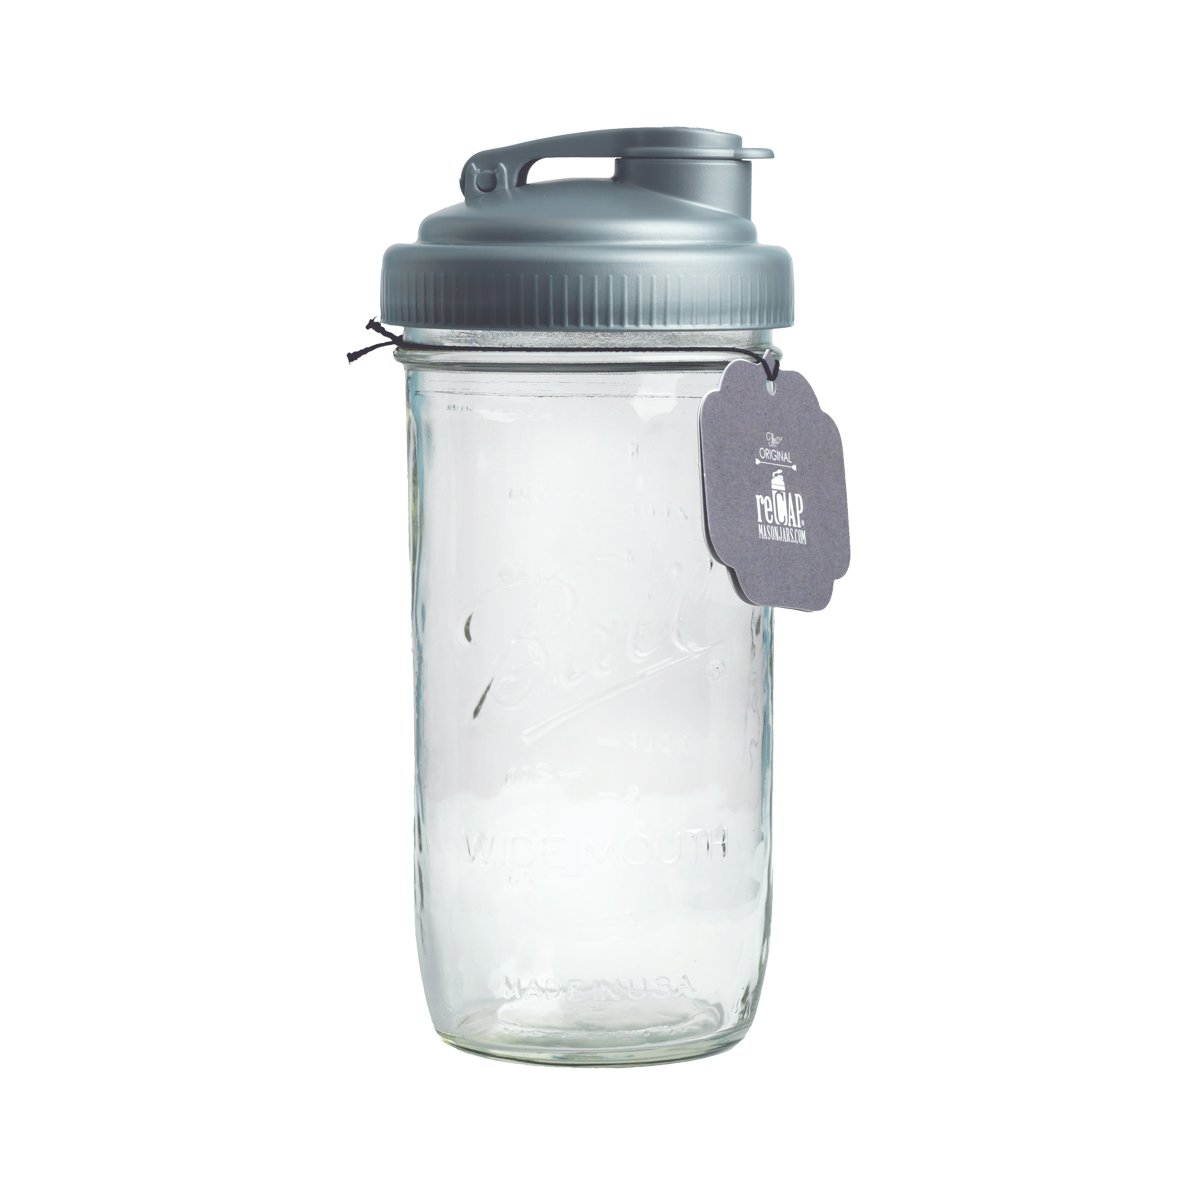 reCAP PJ24-W-SLVR1 Mason Jar Pour Lid & Ball Jar, Silver